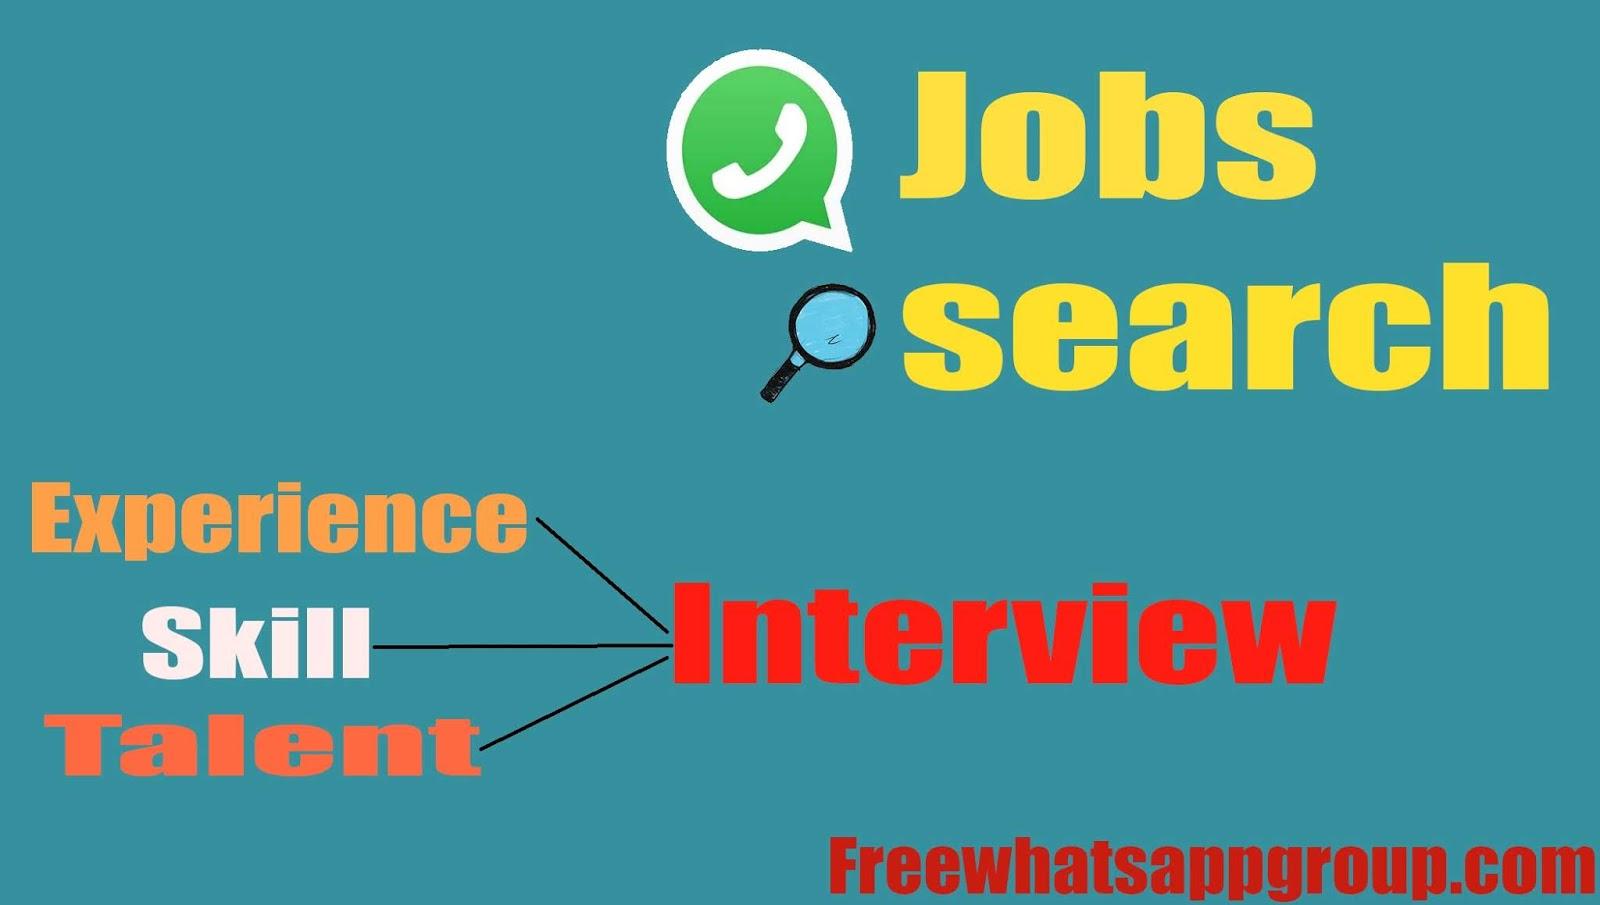 Job vacancy Whatsapp group link, pune job whatsapp group link